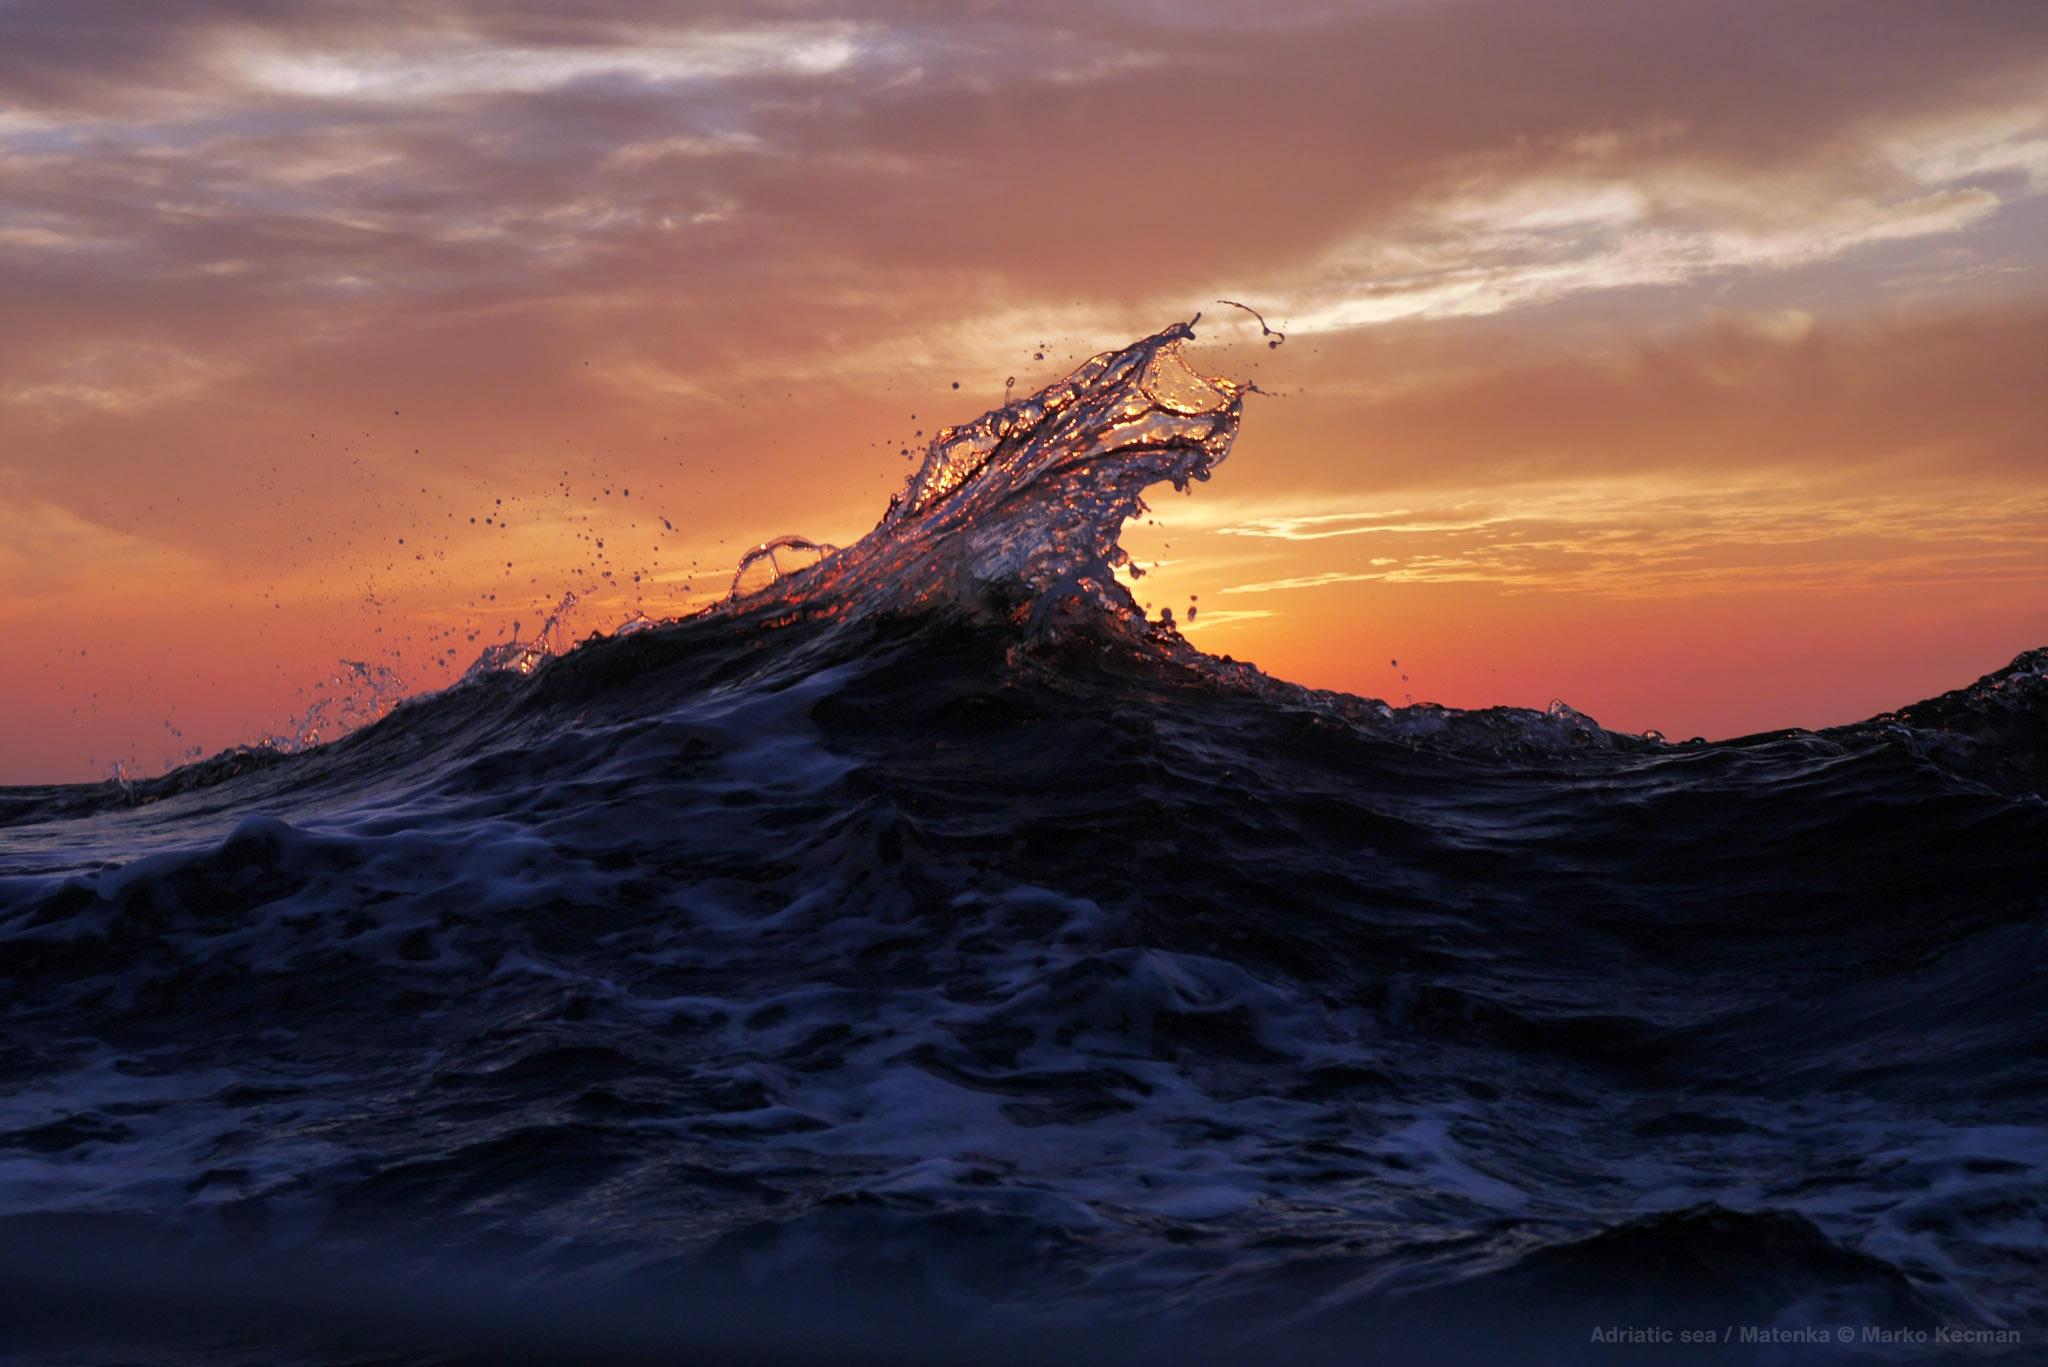 Adriatic Sea / Matenka © Marko Kecman